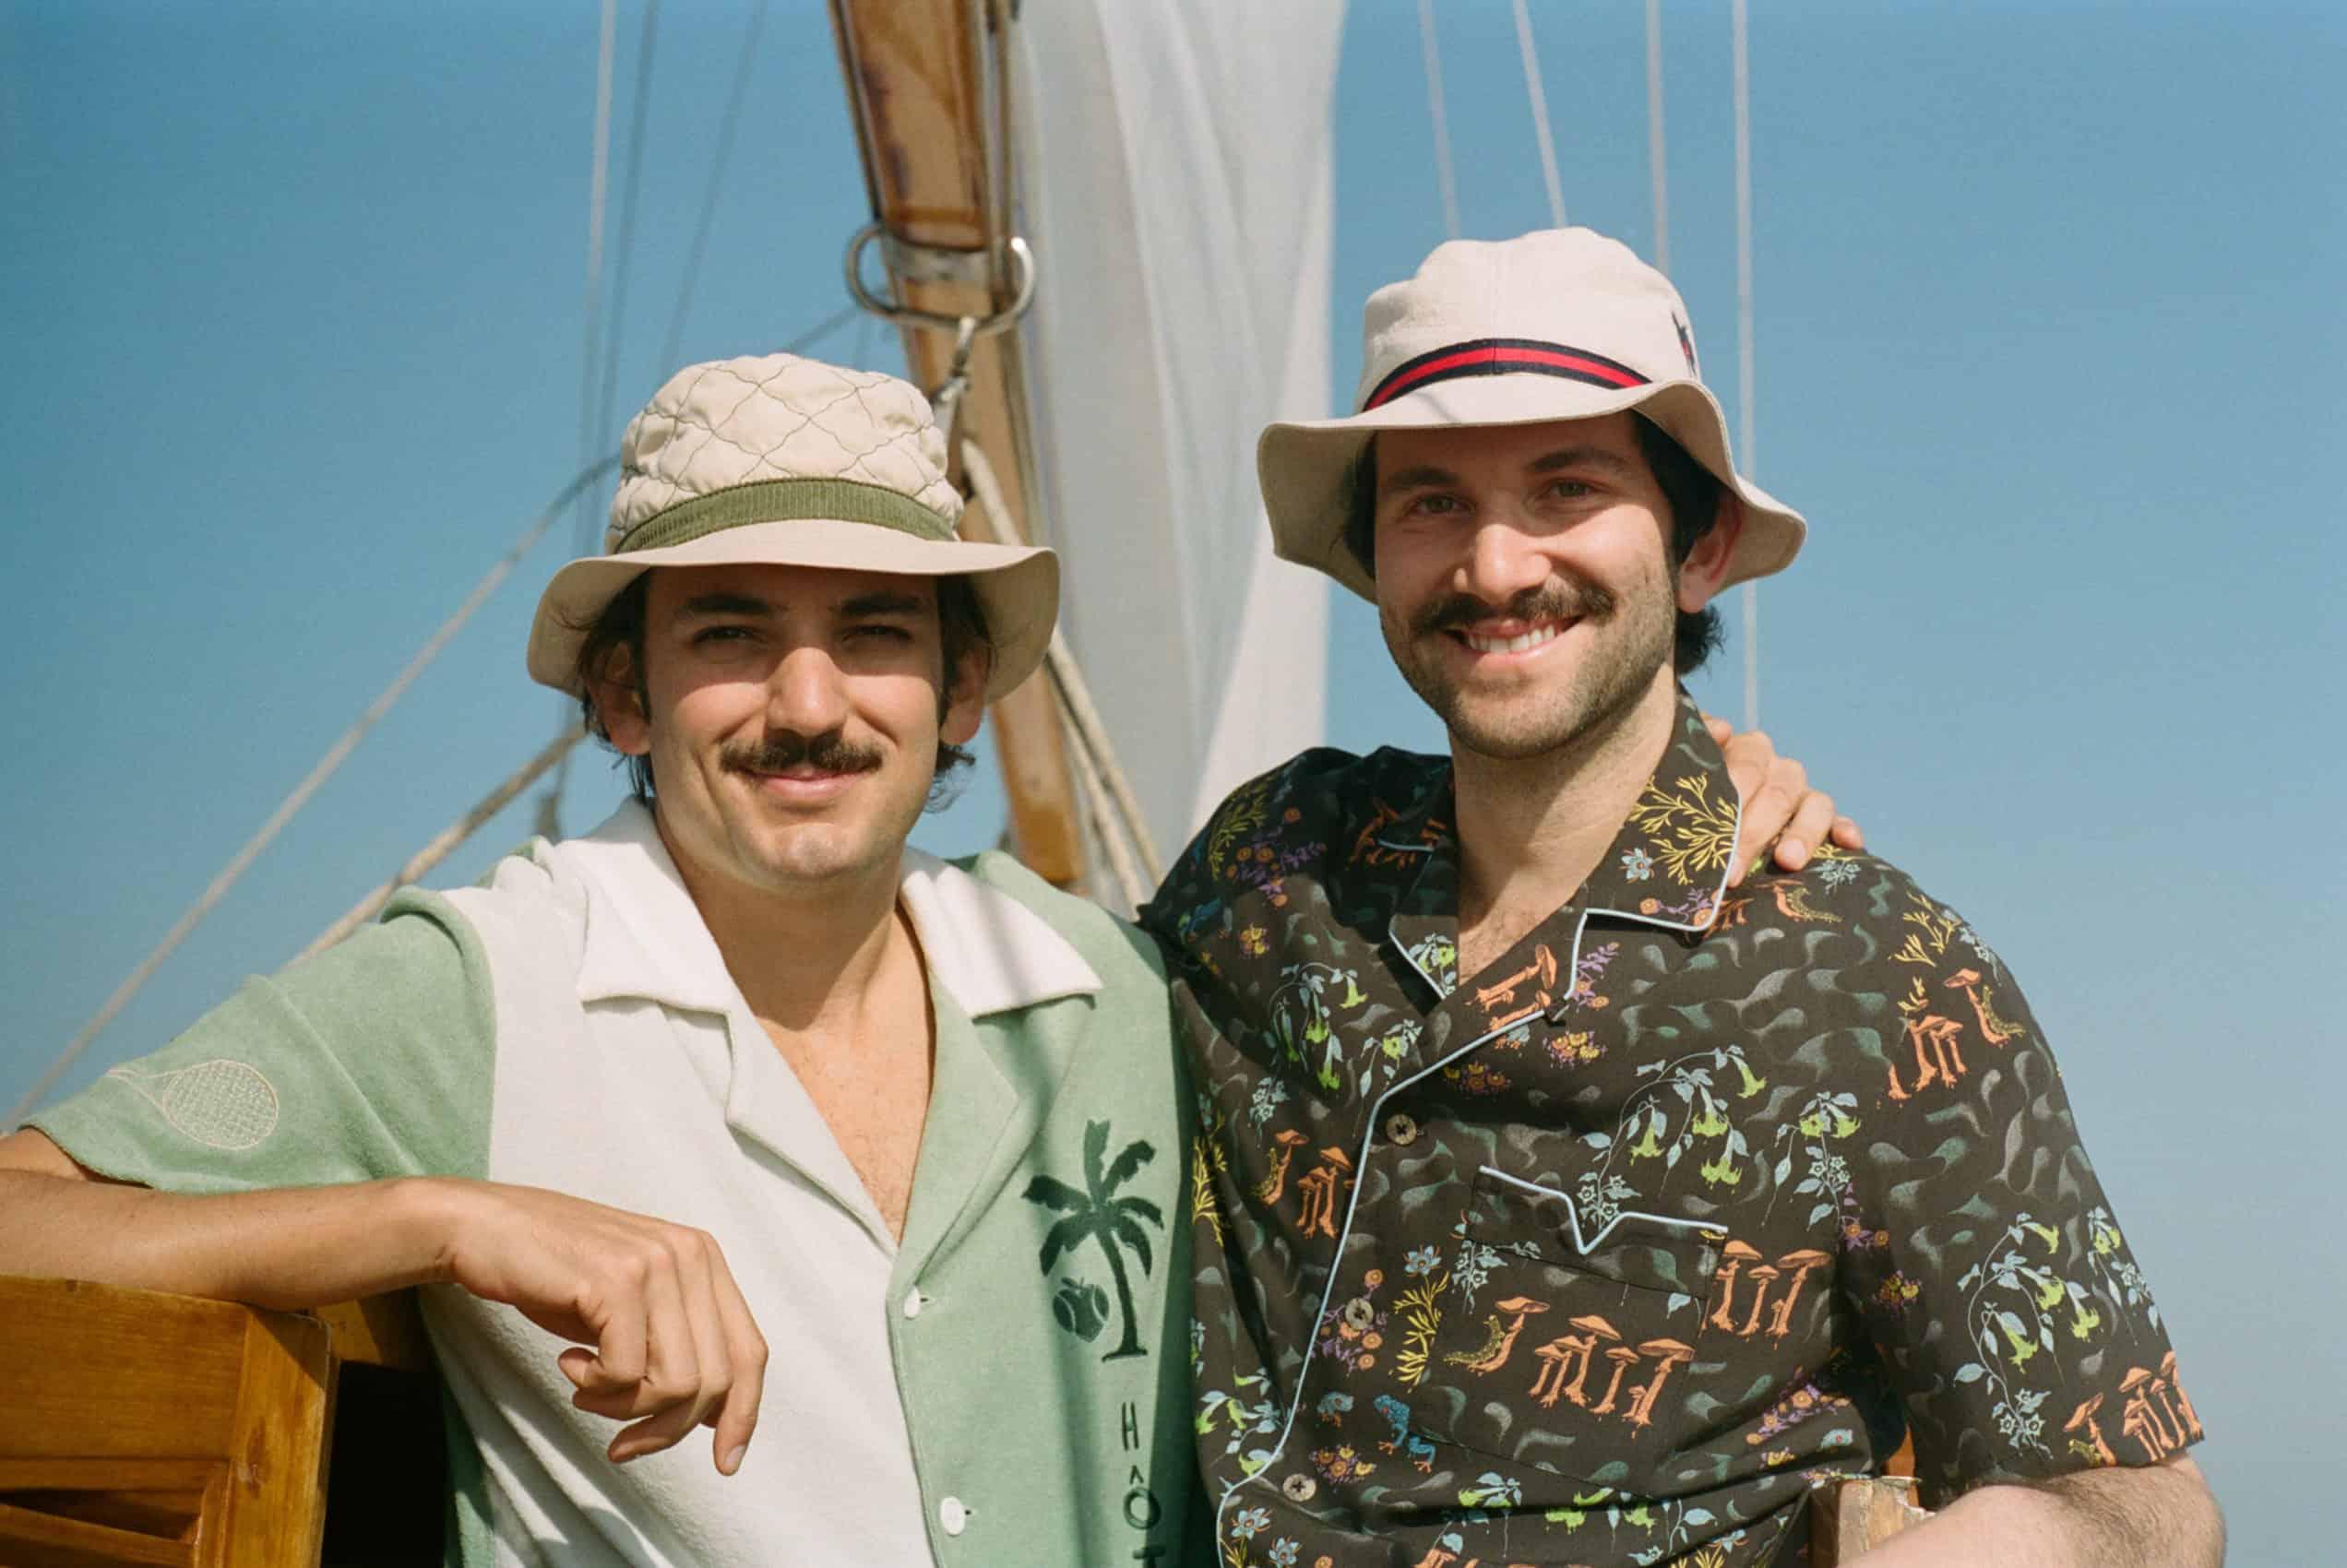 Mike Sard and Chris Galasso